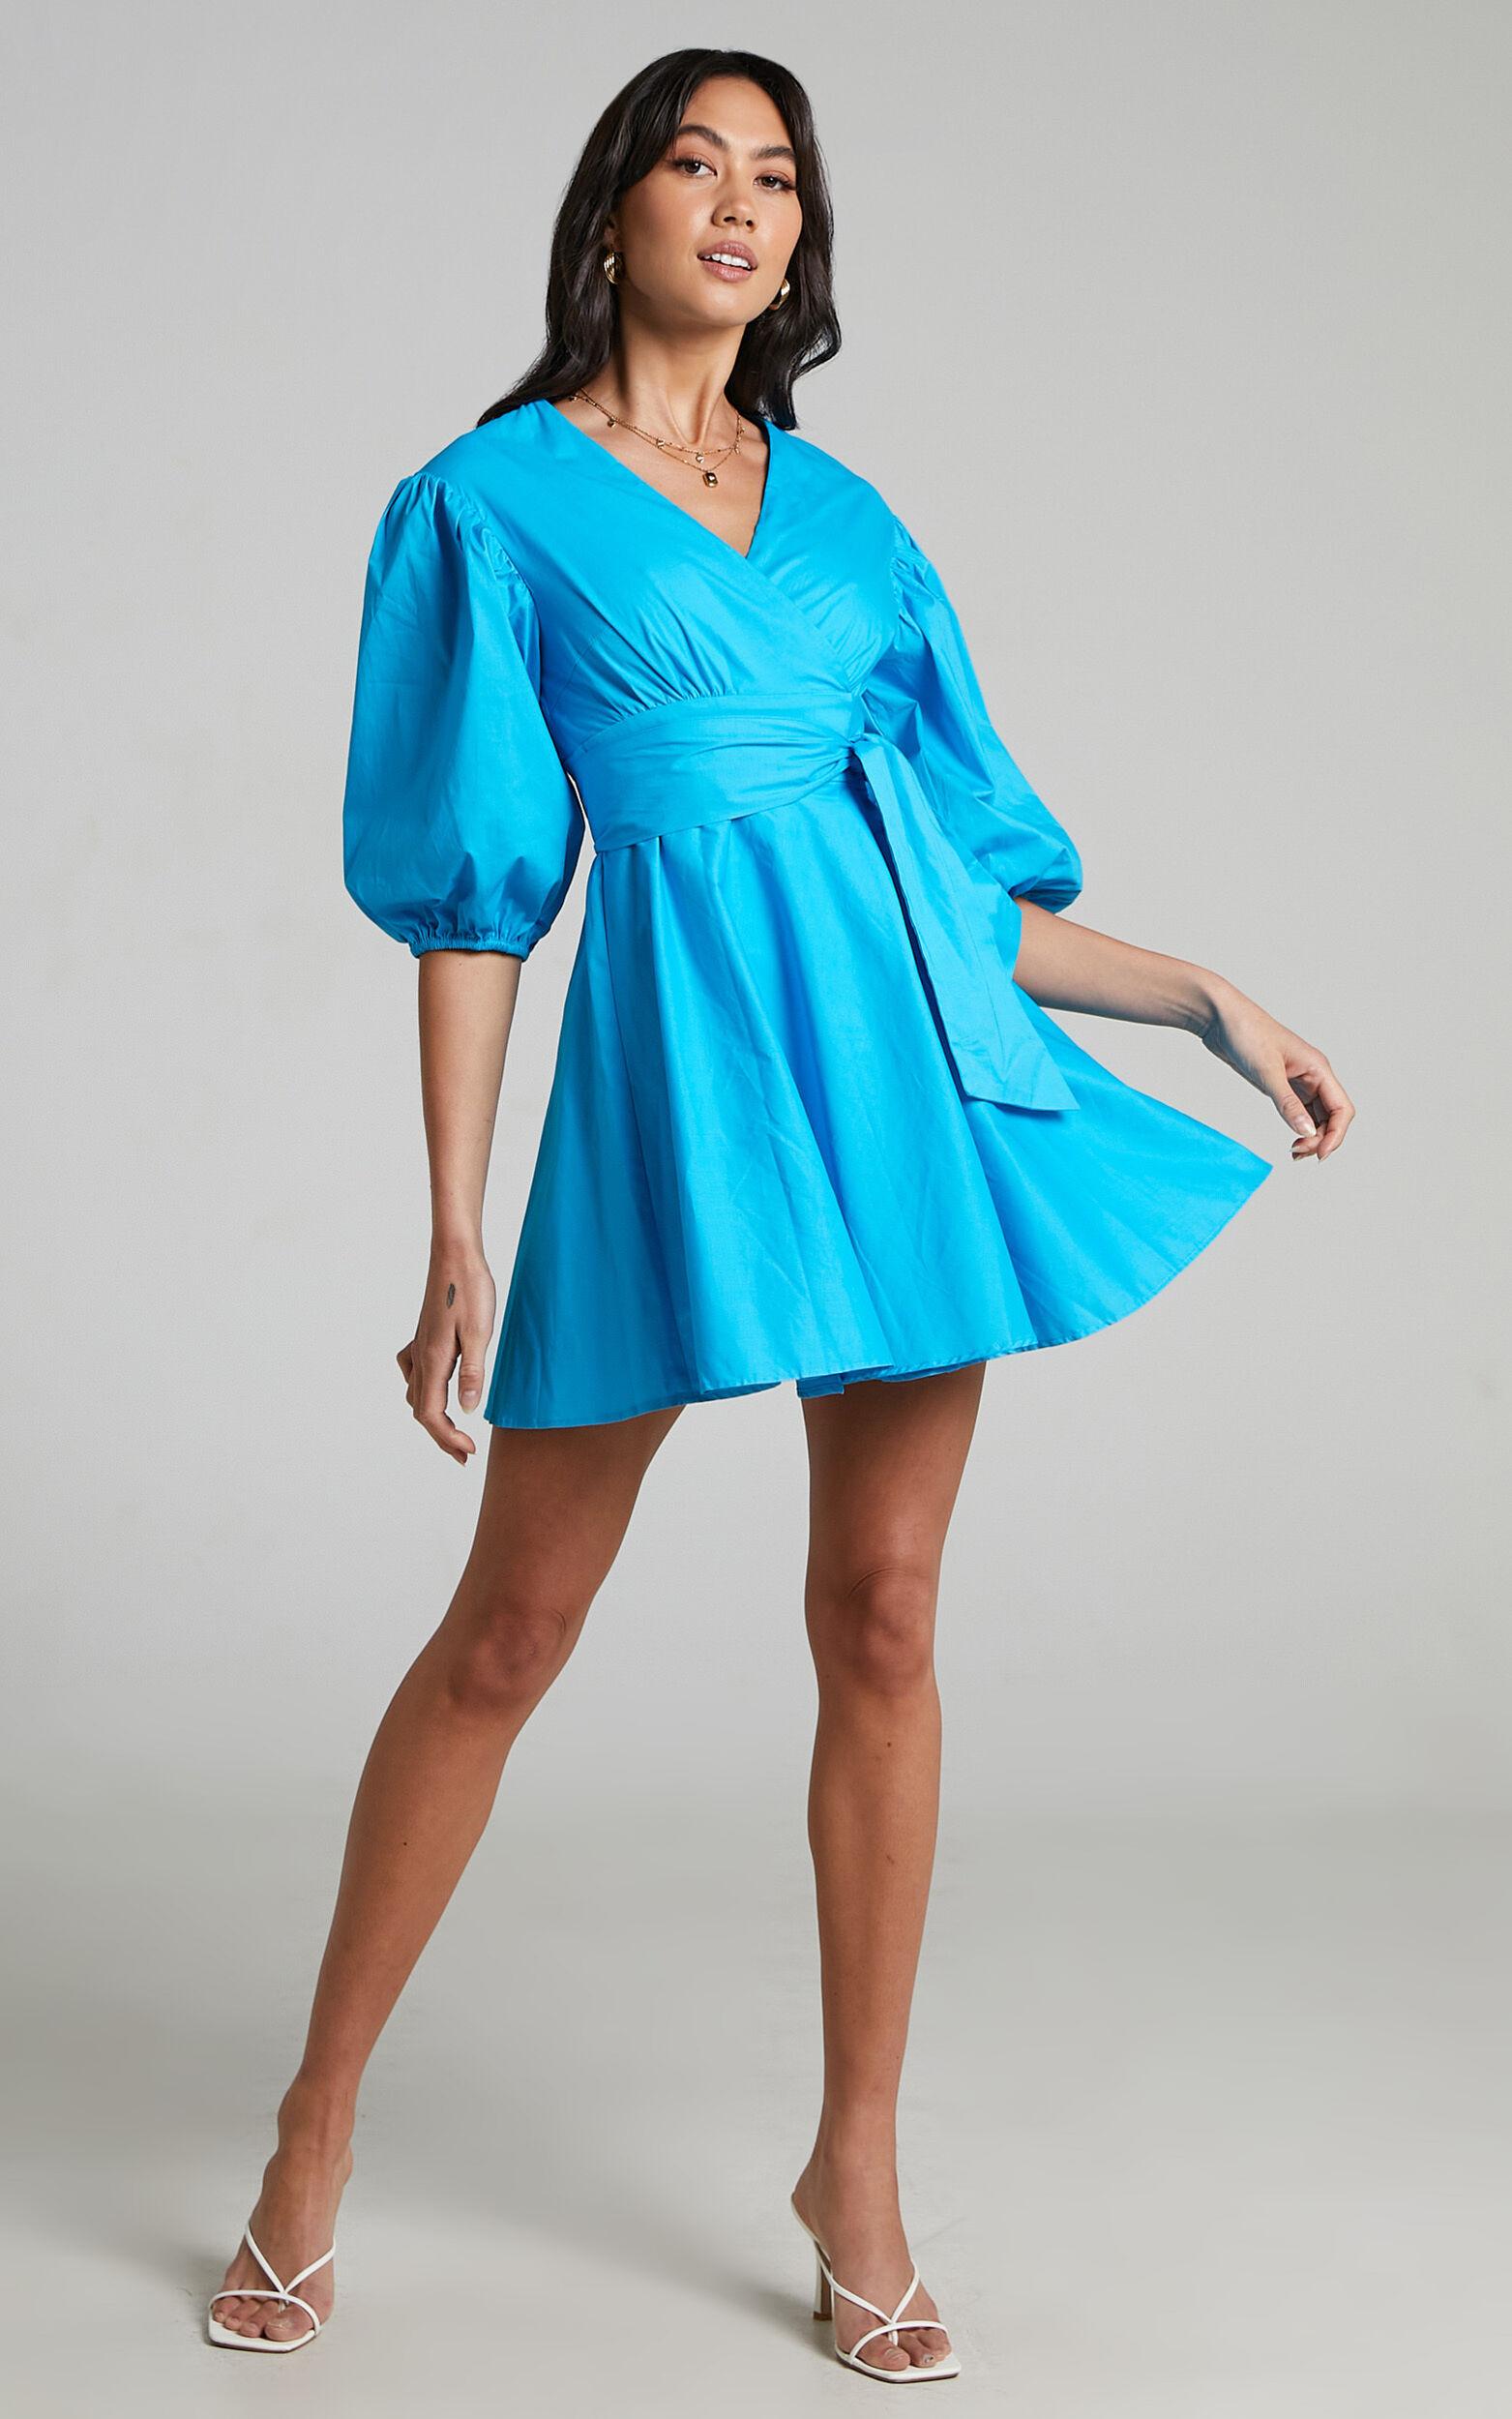 Zyla Puff Sleeve Wrap Mini Dress in Blue - 04, BLU3, super-hi-res image number null